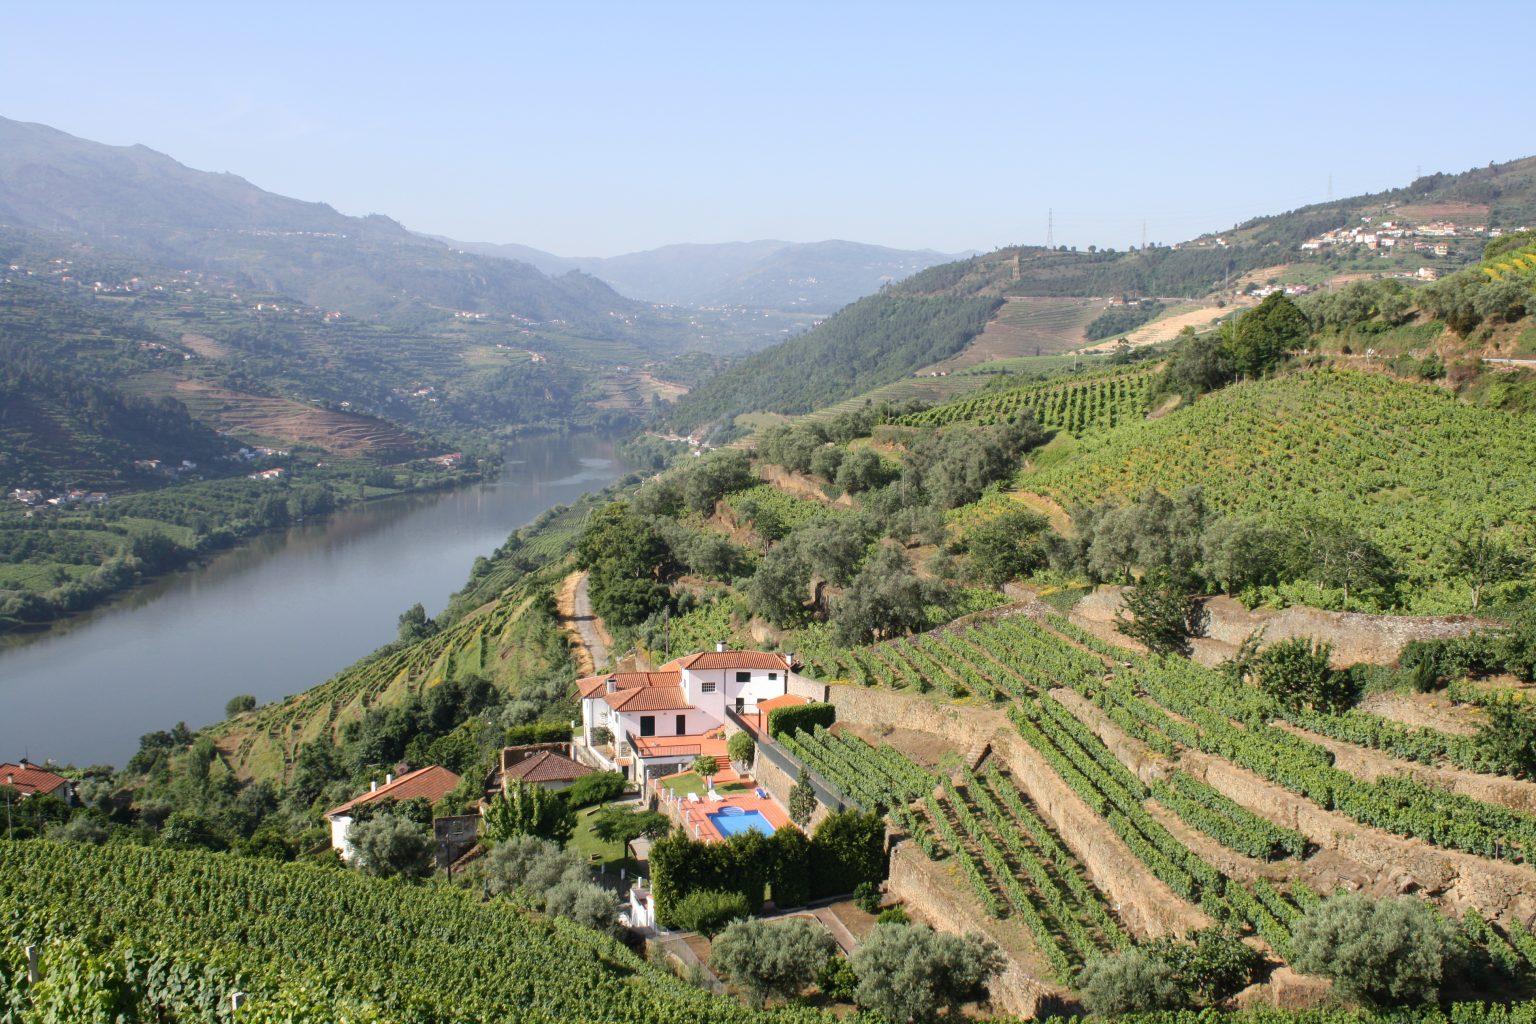 douro-7-1536x1024.jpg